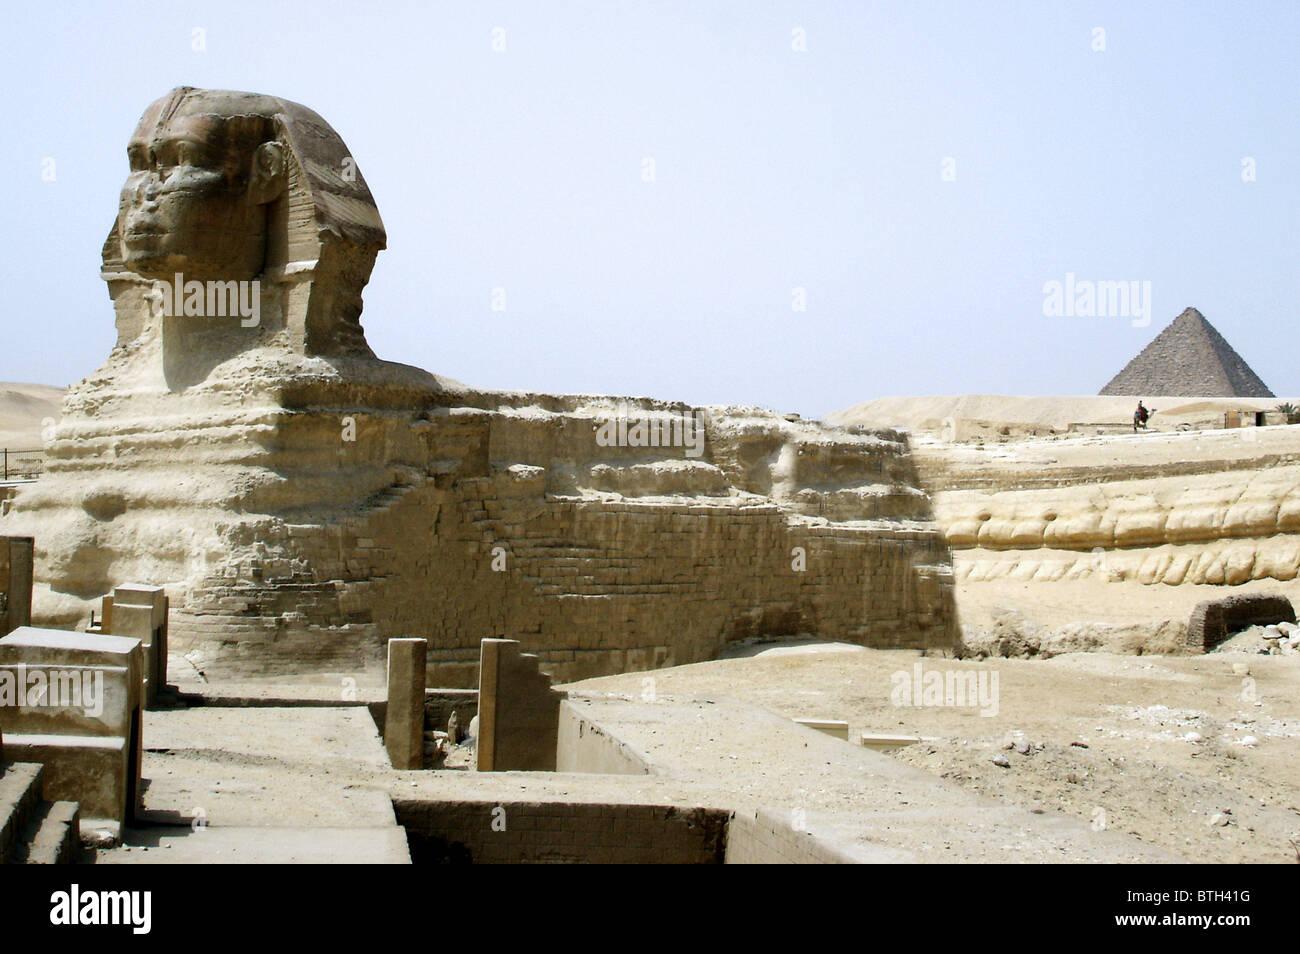 Cairo Egypt Travel Vacation Destination Photos Stock Photo Alamy